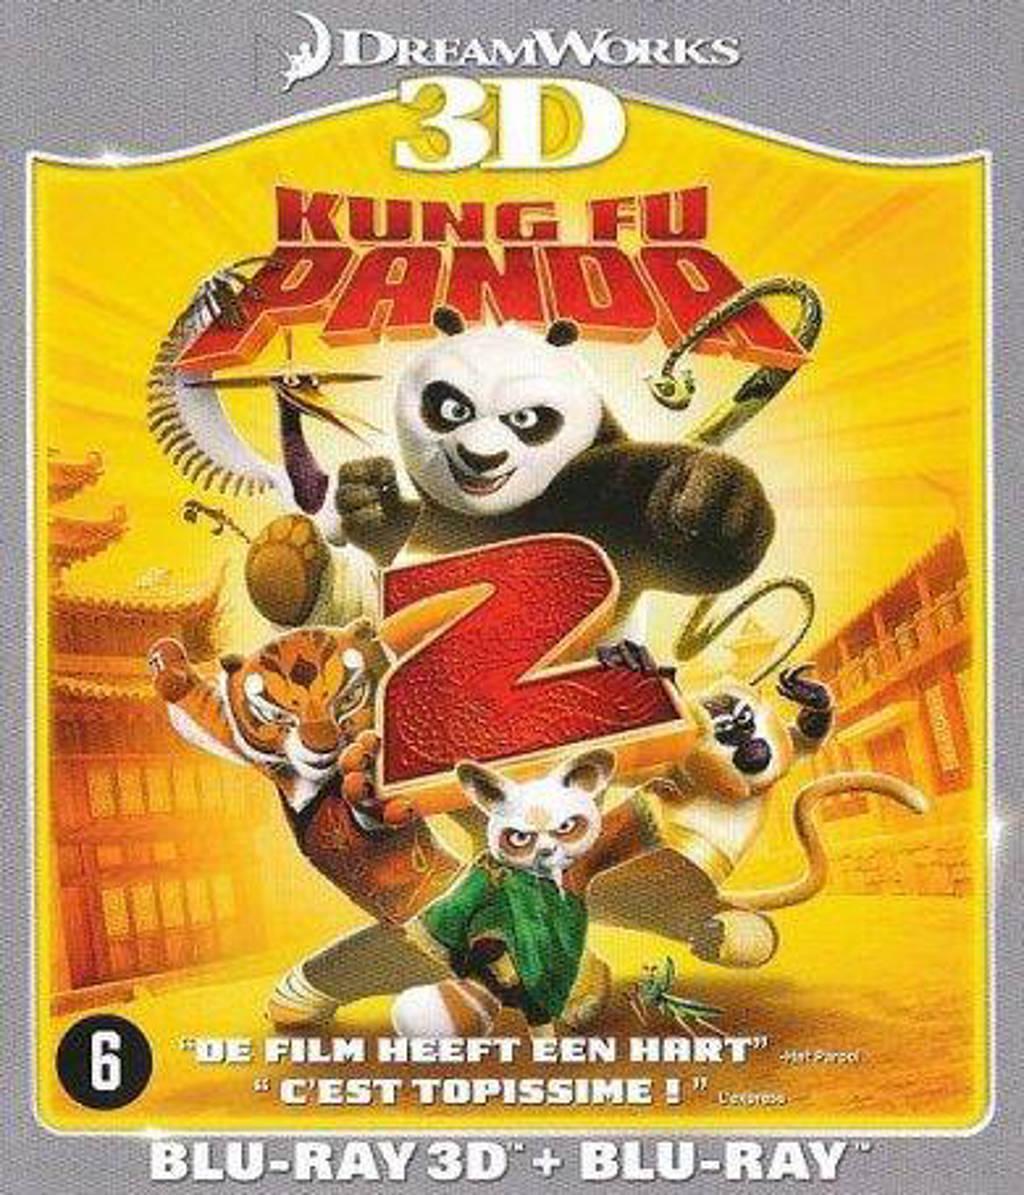 Kung fu panda 2 (3D) (Blu-ray)